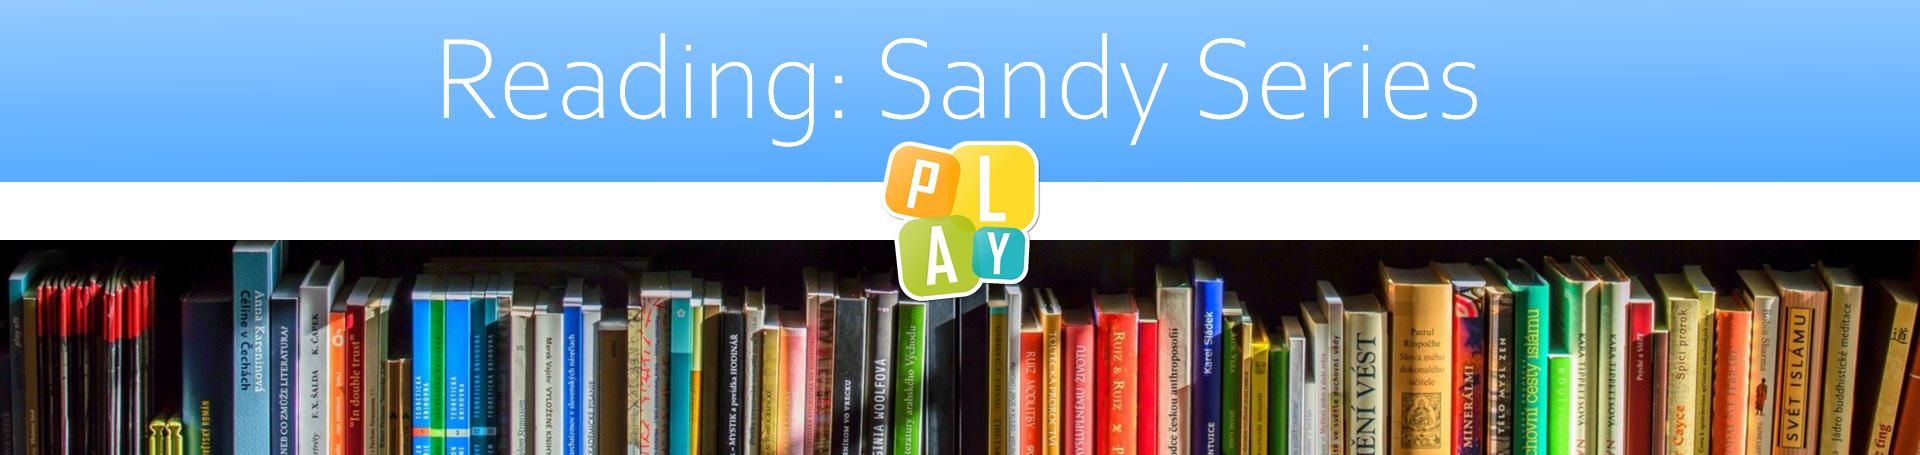 Header Reading: Sandy Series